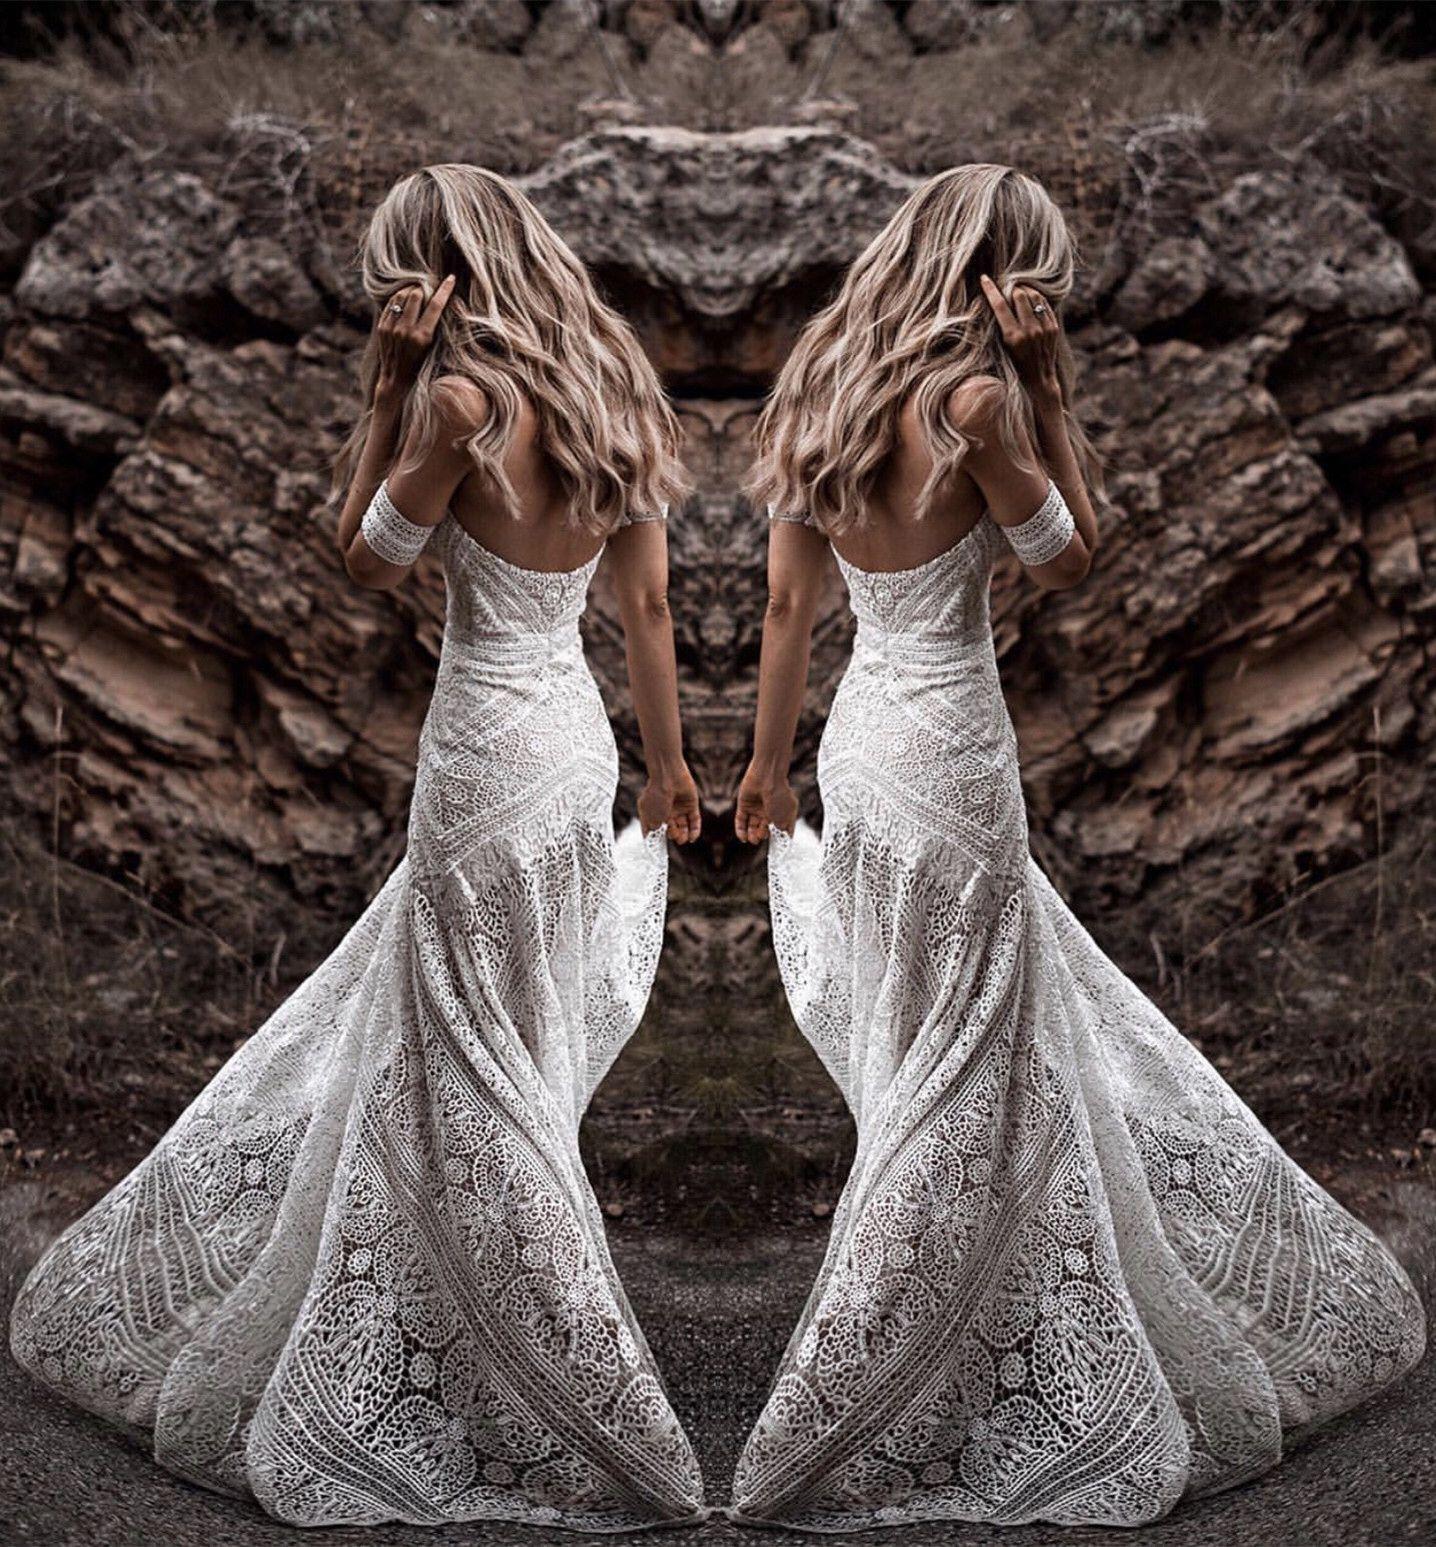 aacd5c8c78 Boho Style Summer Lace Mermaid Wedding Dresses in 2019